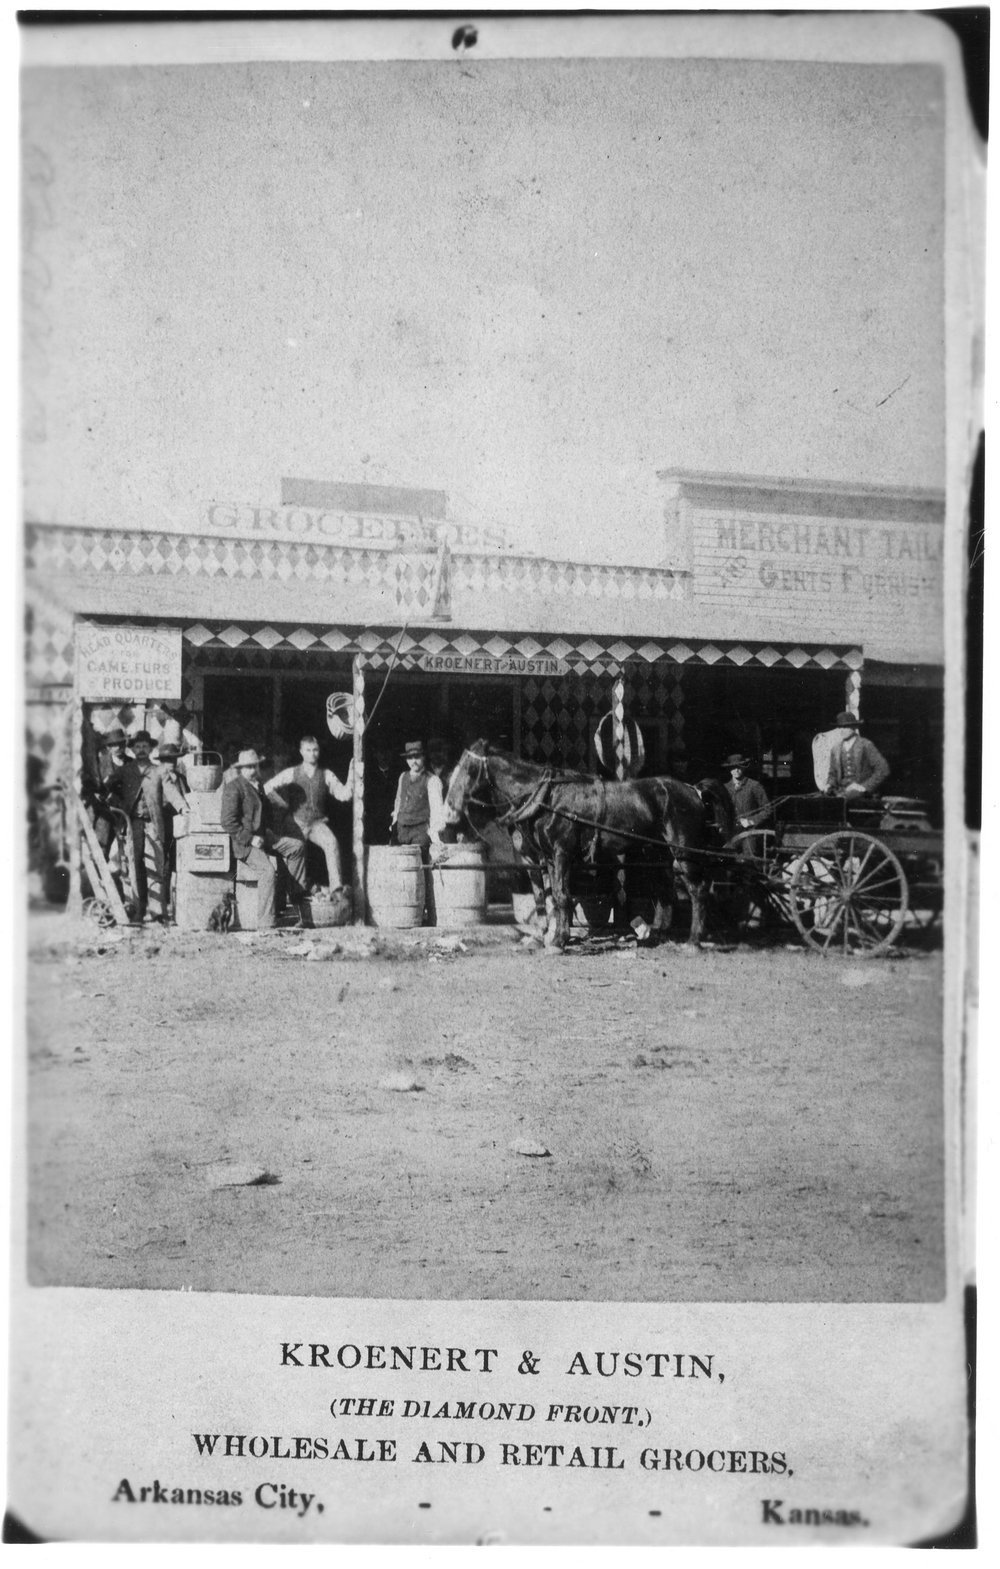 Kroenert & Austin Grocers, Arkansas City, Kansas